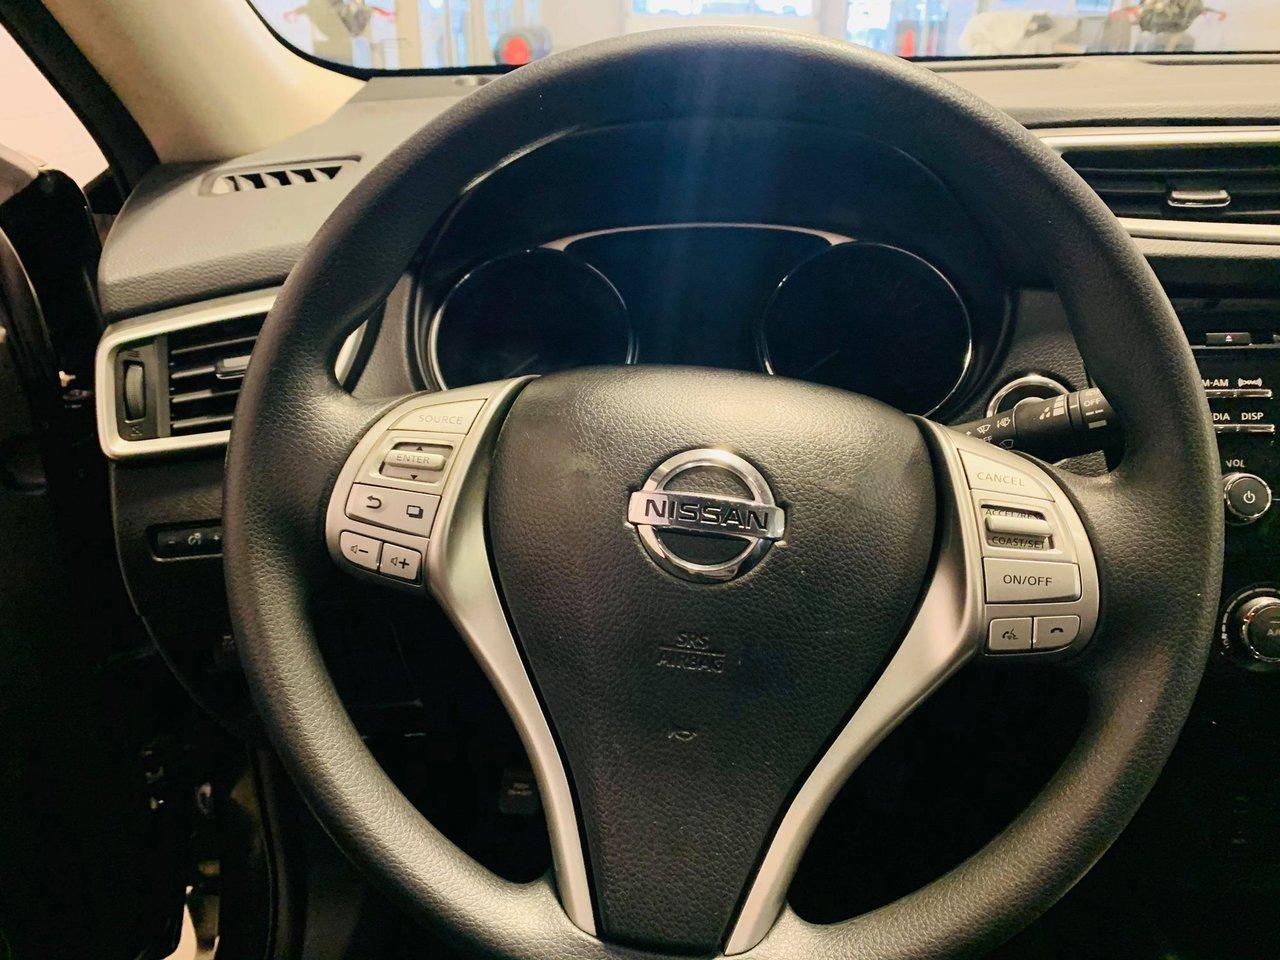 2016 Nissan Rogue FWD 4dr SV